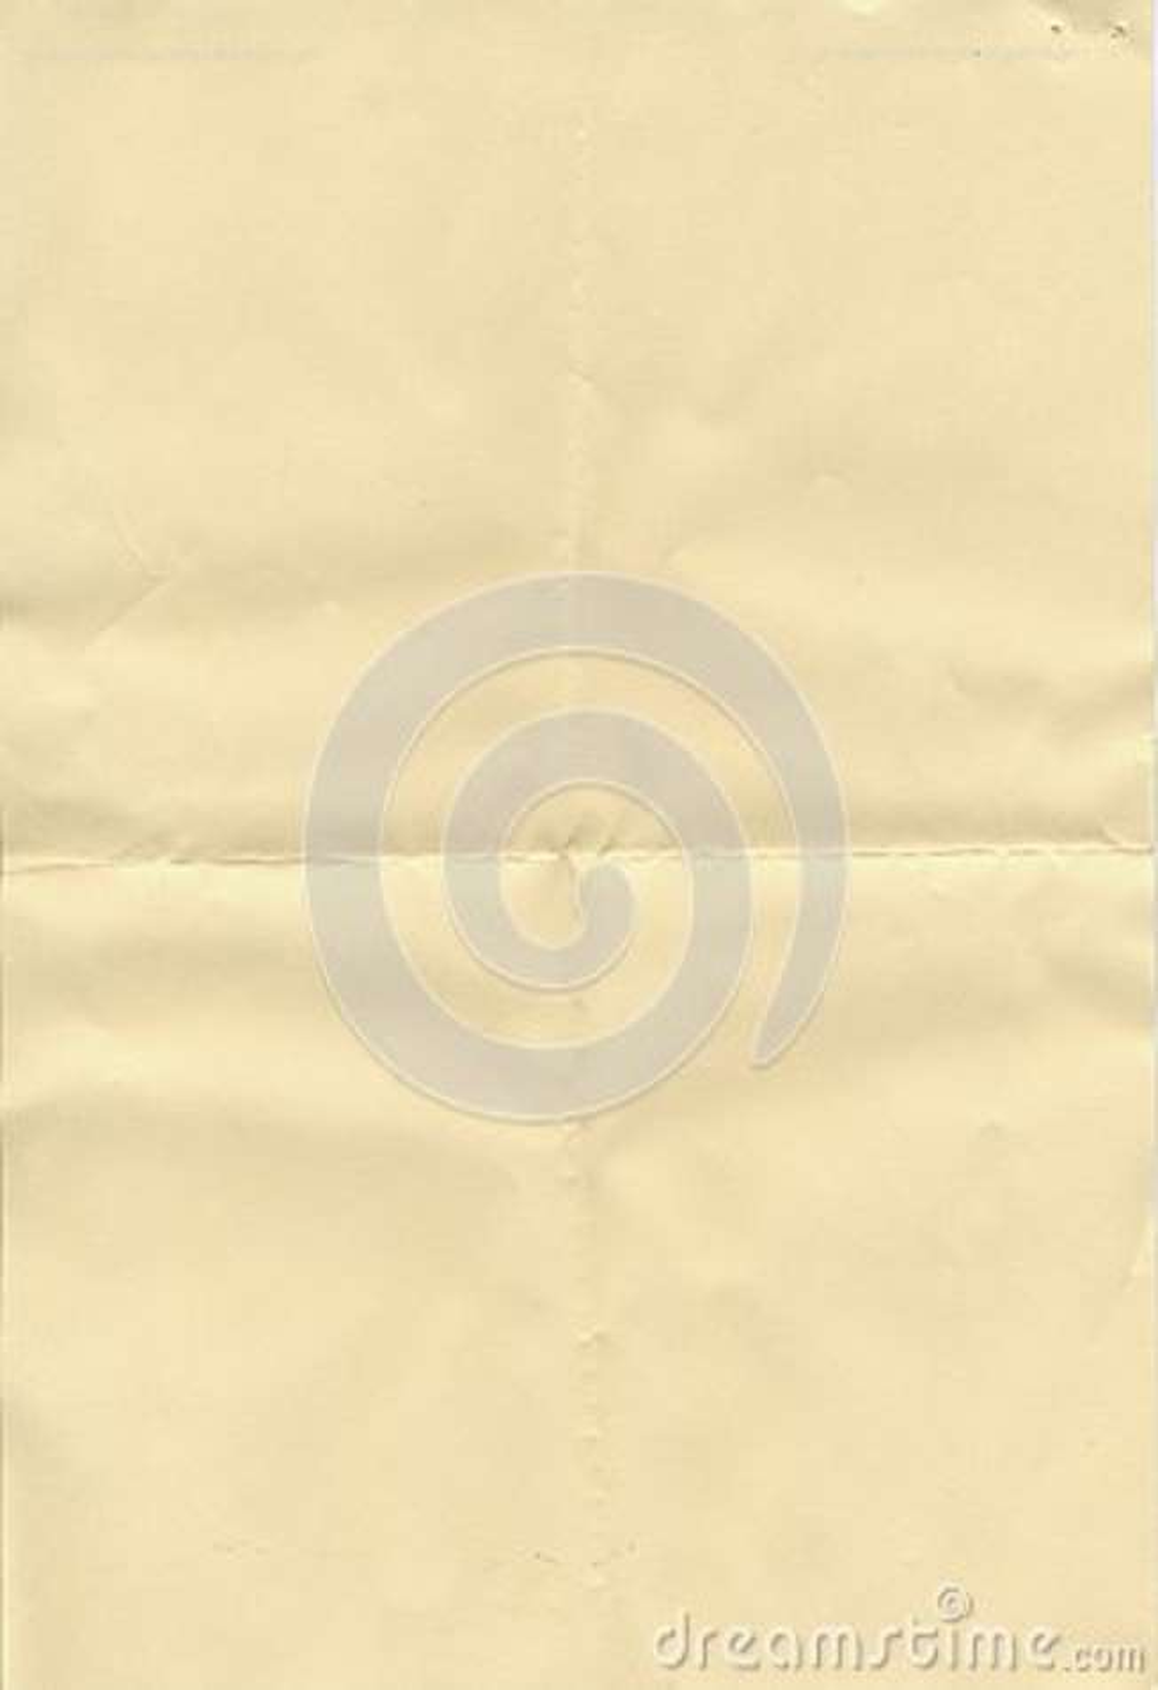 Download Fundo de papel amarelo foto de stock. Imagem de grunge - 29242768